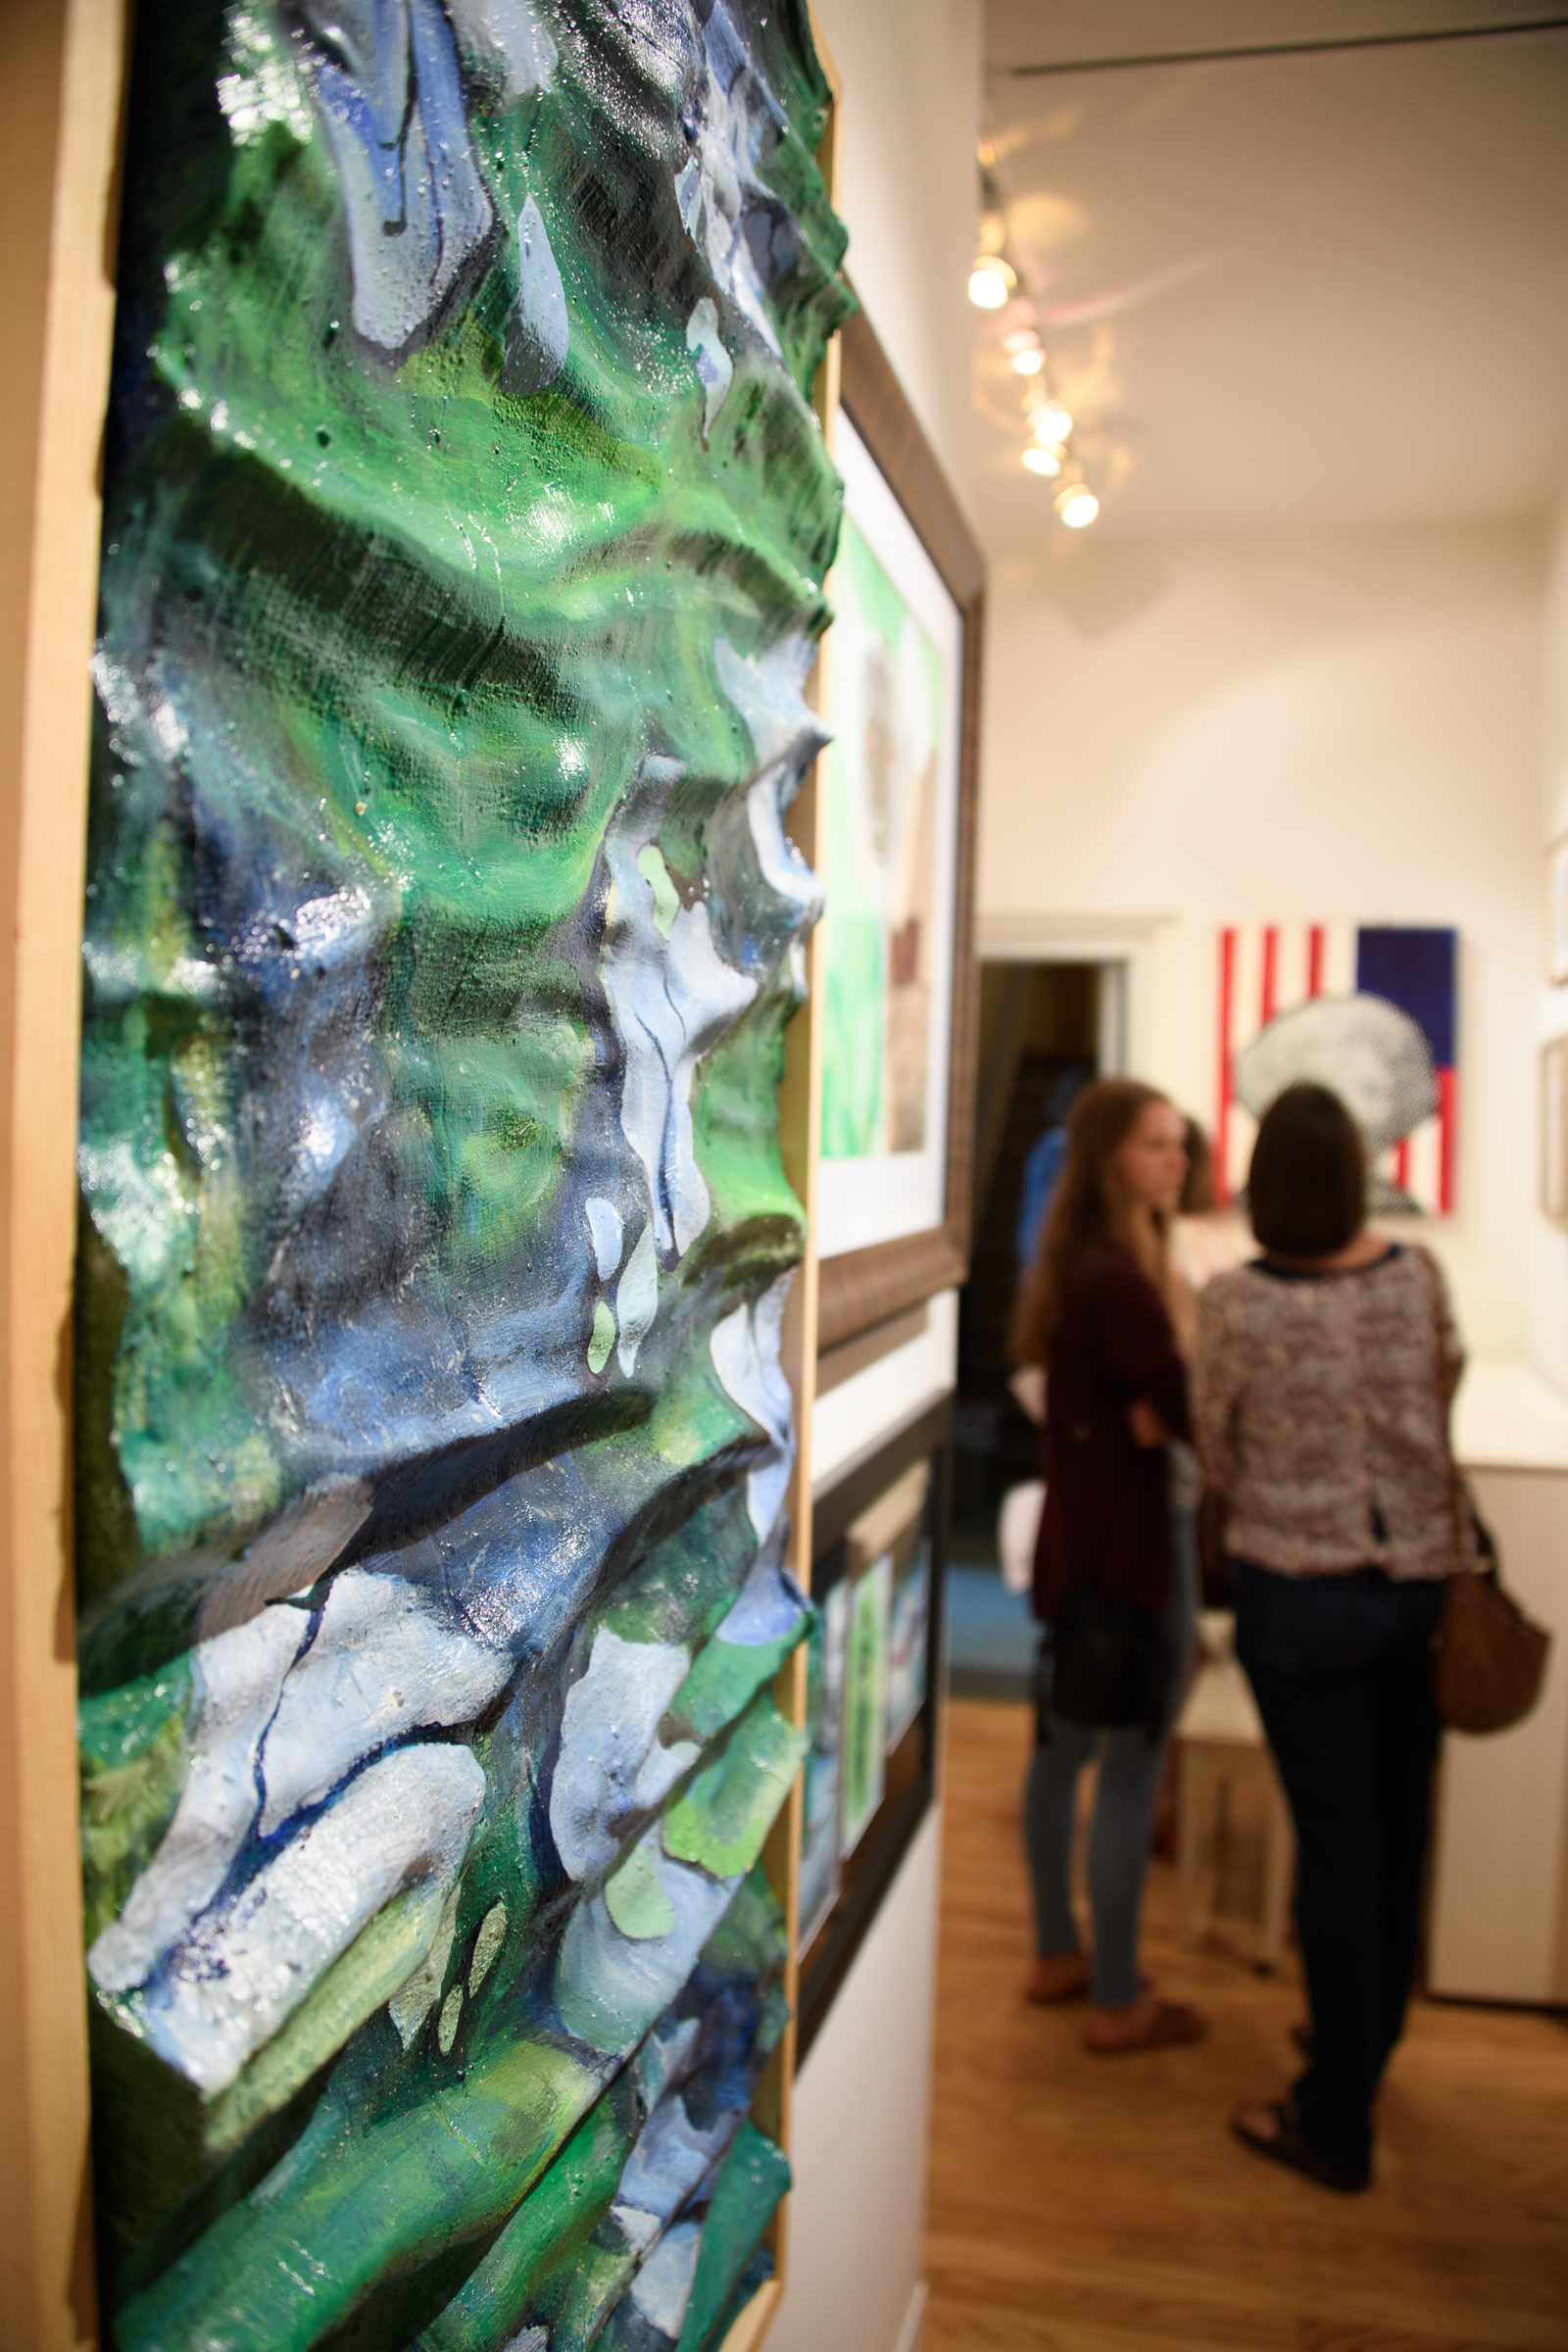 32nd Annual High School Juried Art Show